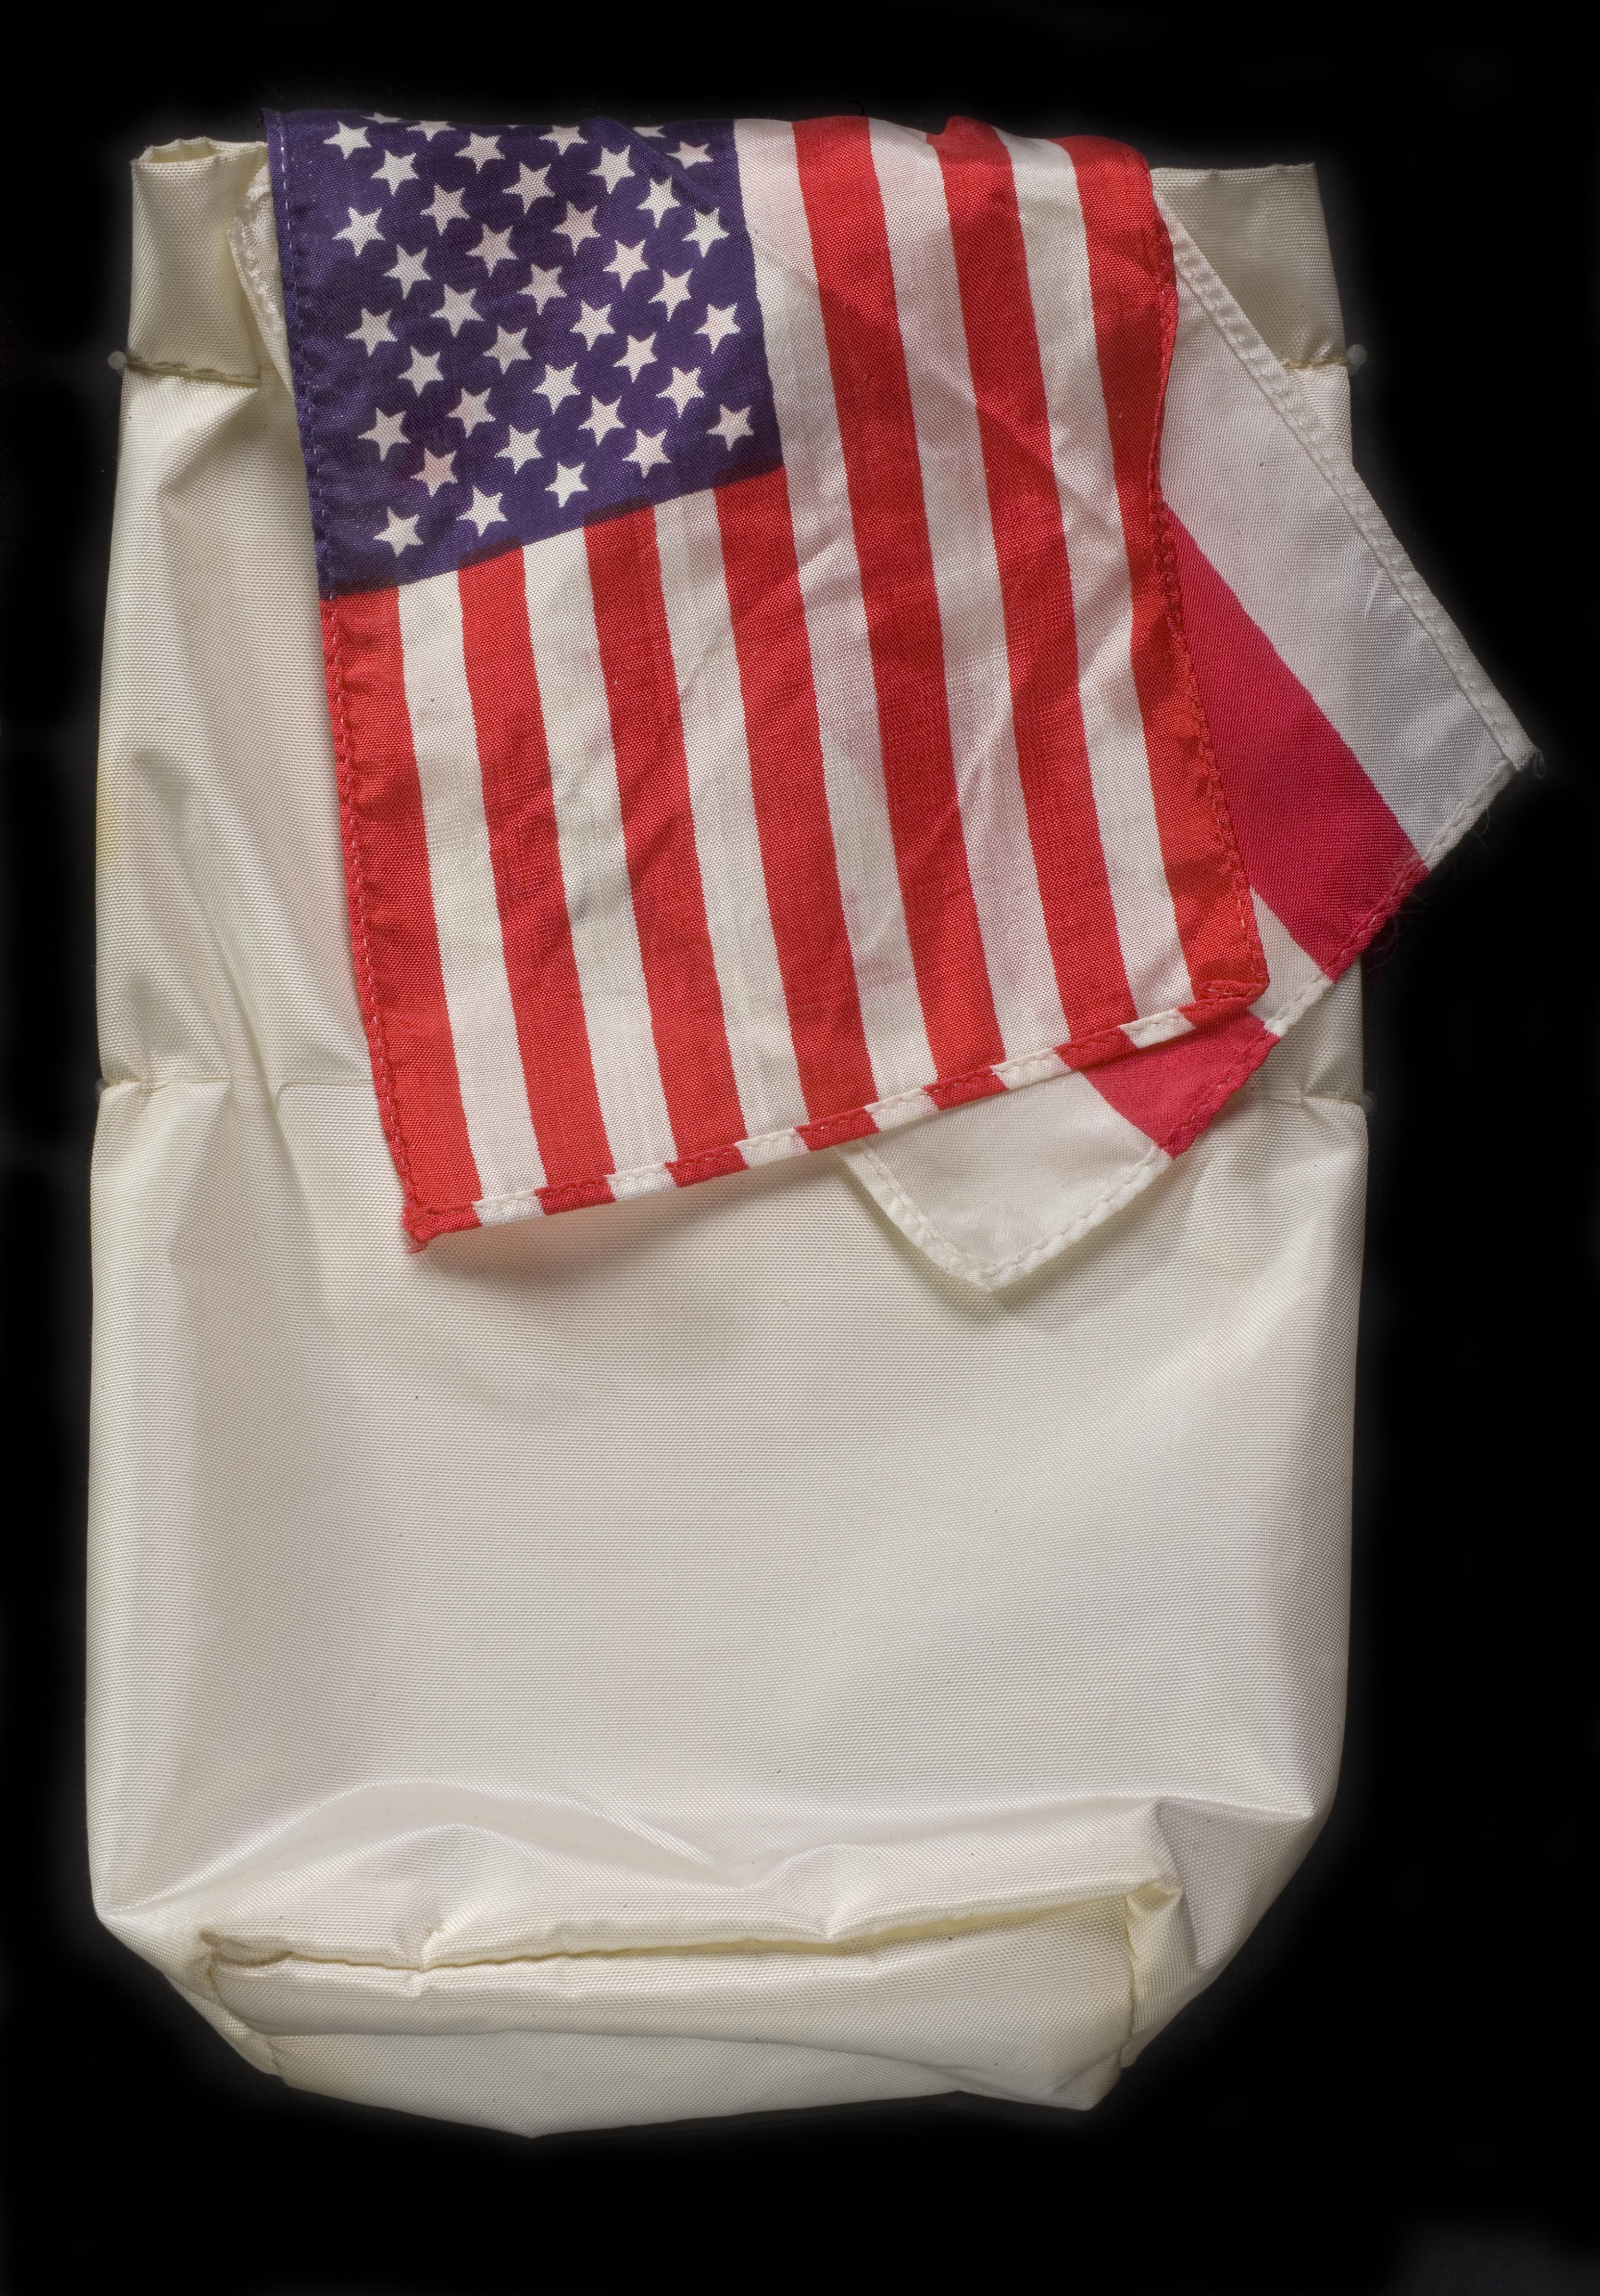 Flag, United States of America, Apollo 11